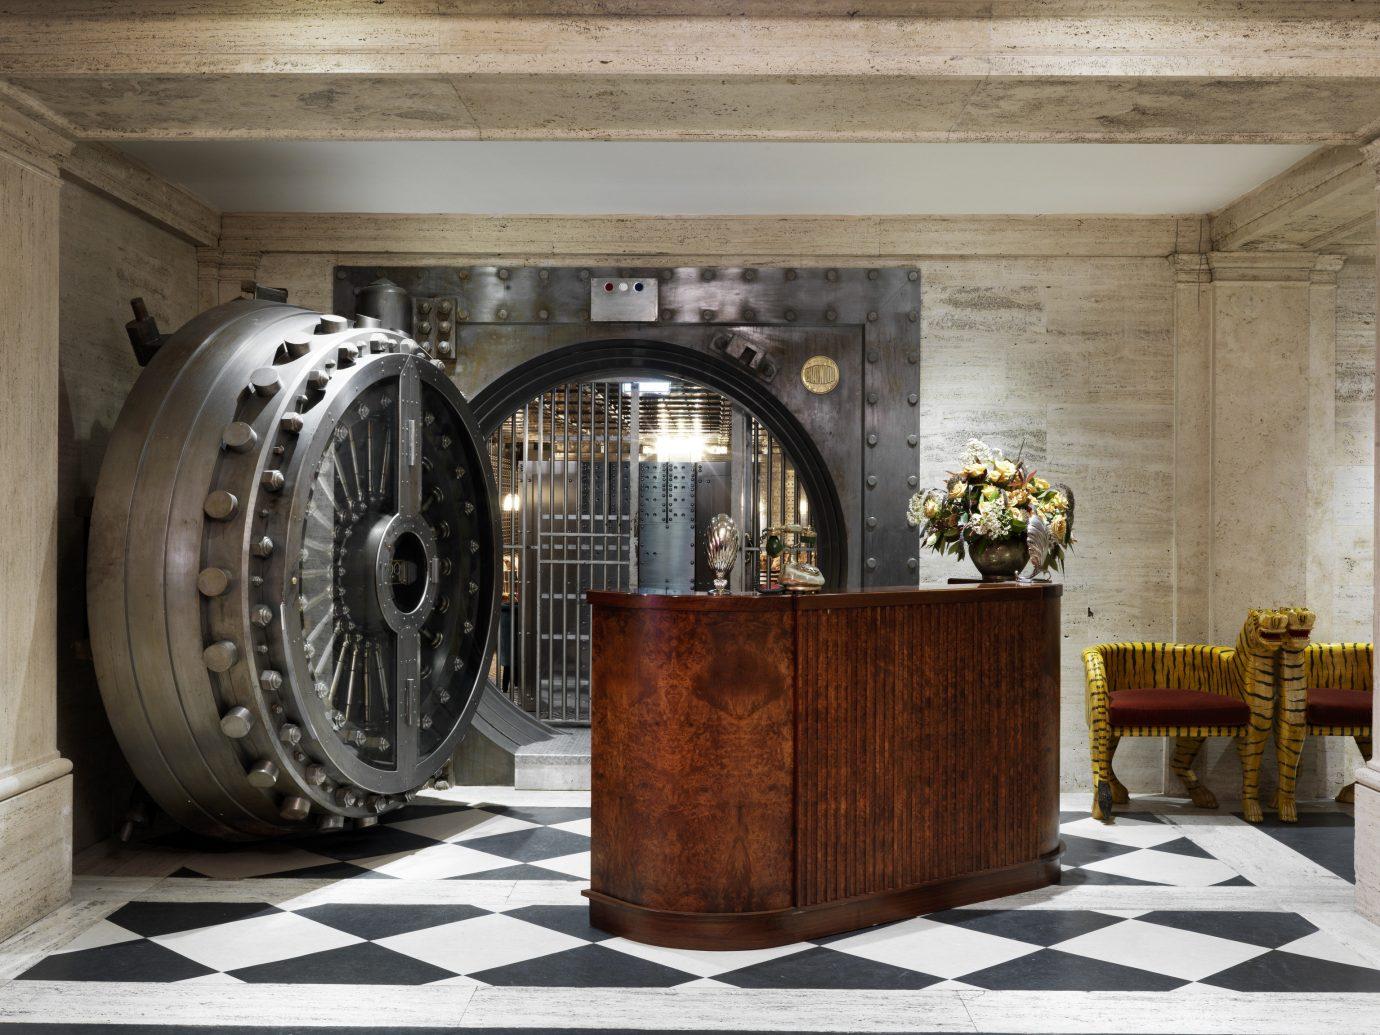 Boutique Hotels Hotels Luxury Travel indoor furniture interior design table flooring